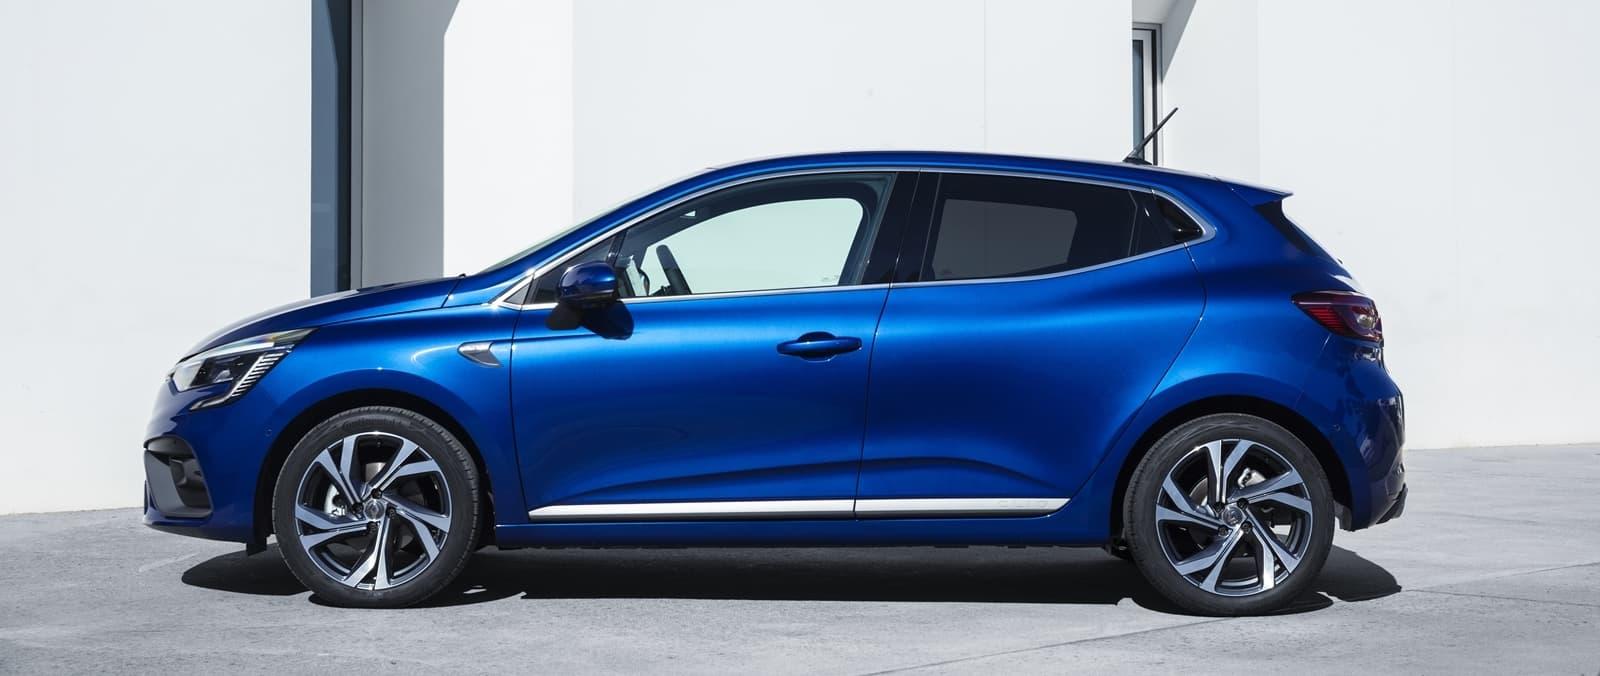 Renault Clio 2020 Prueba 0619 036